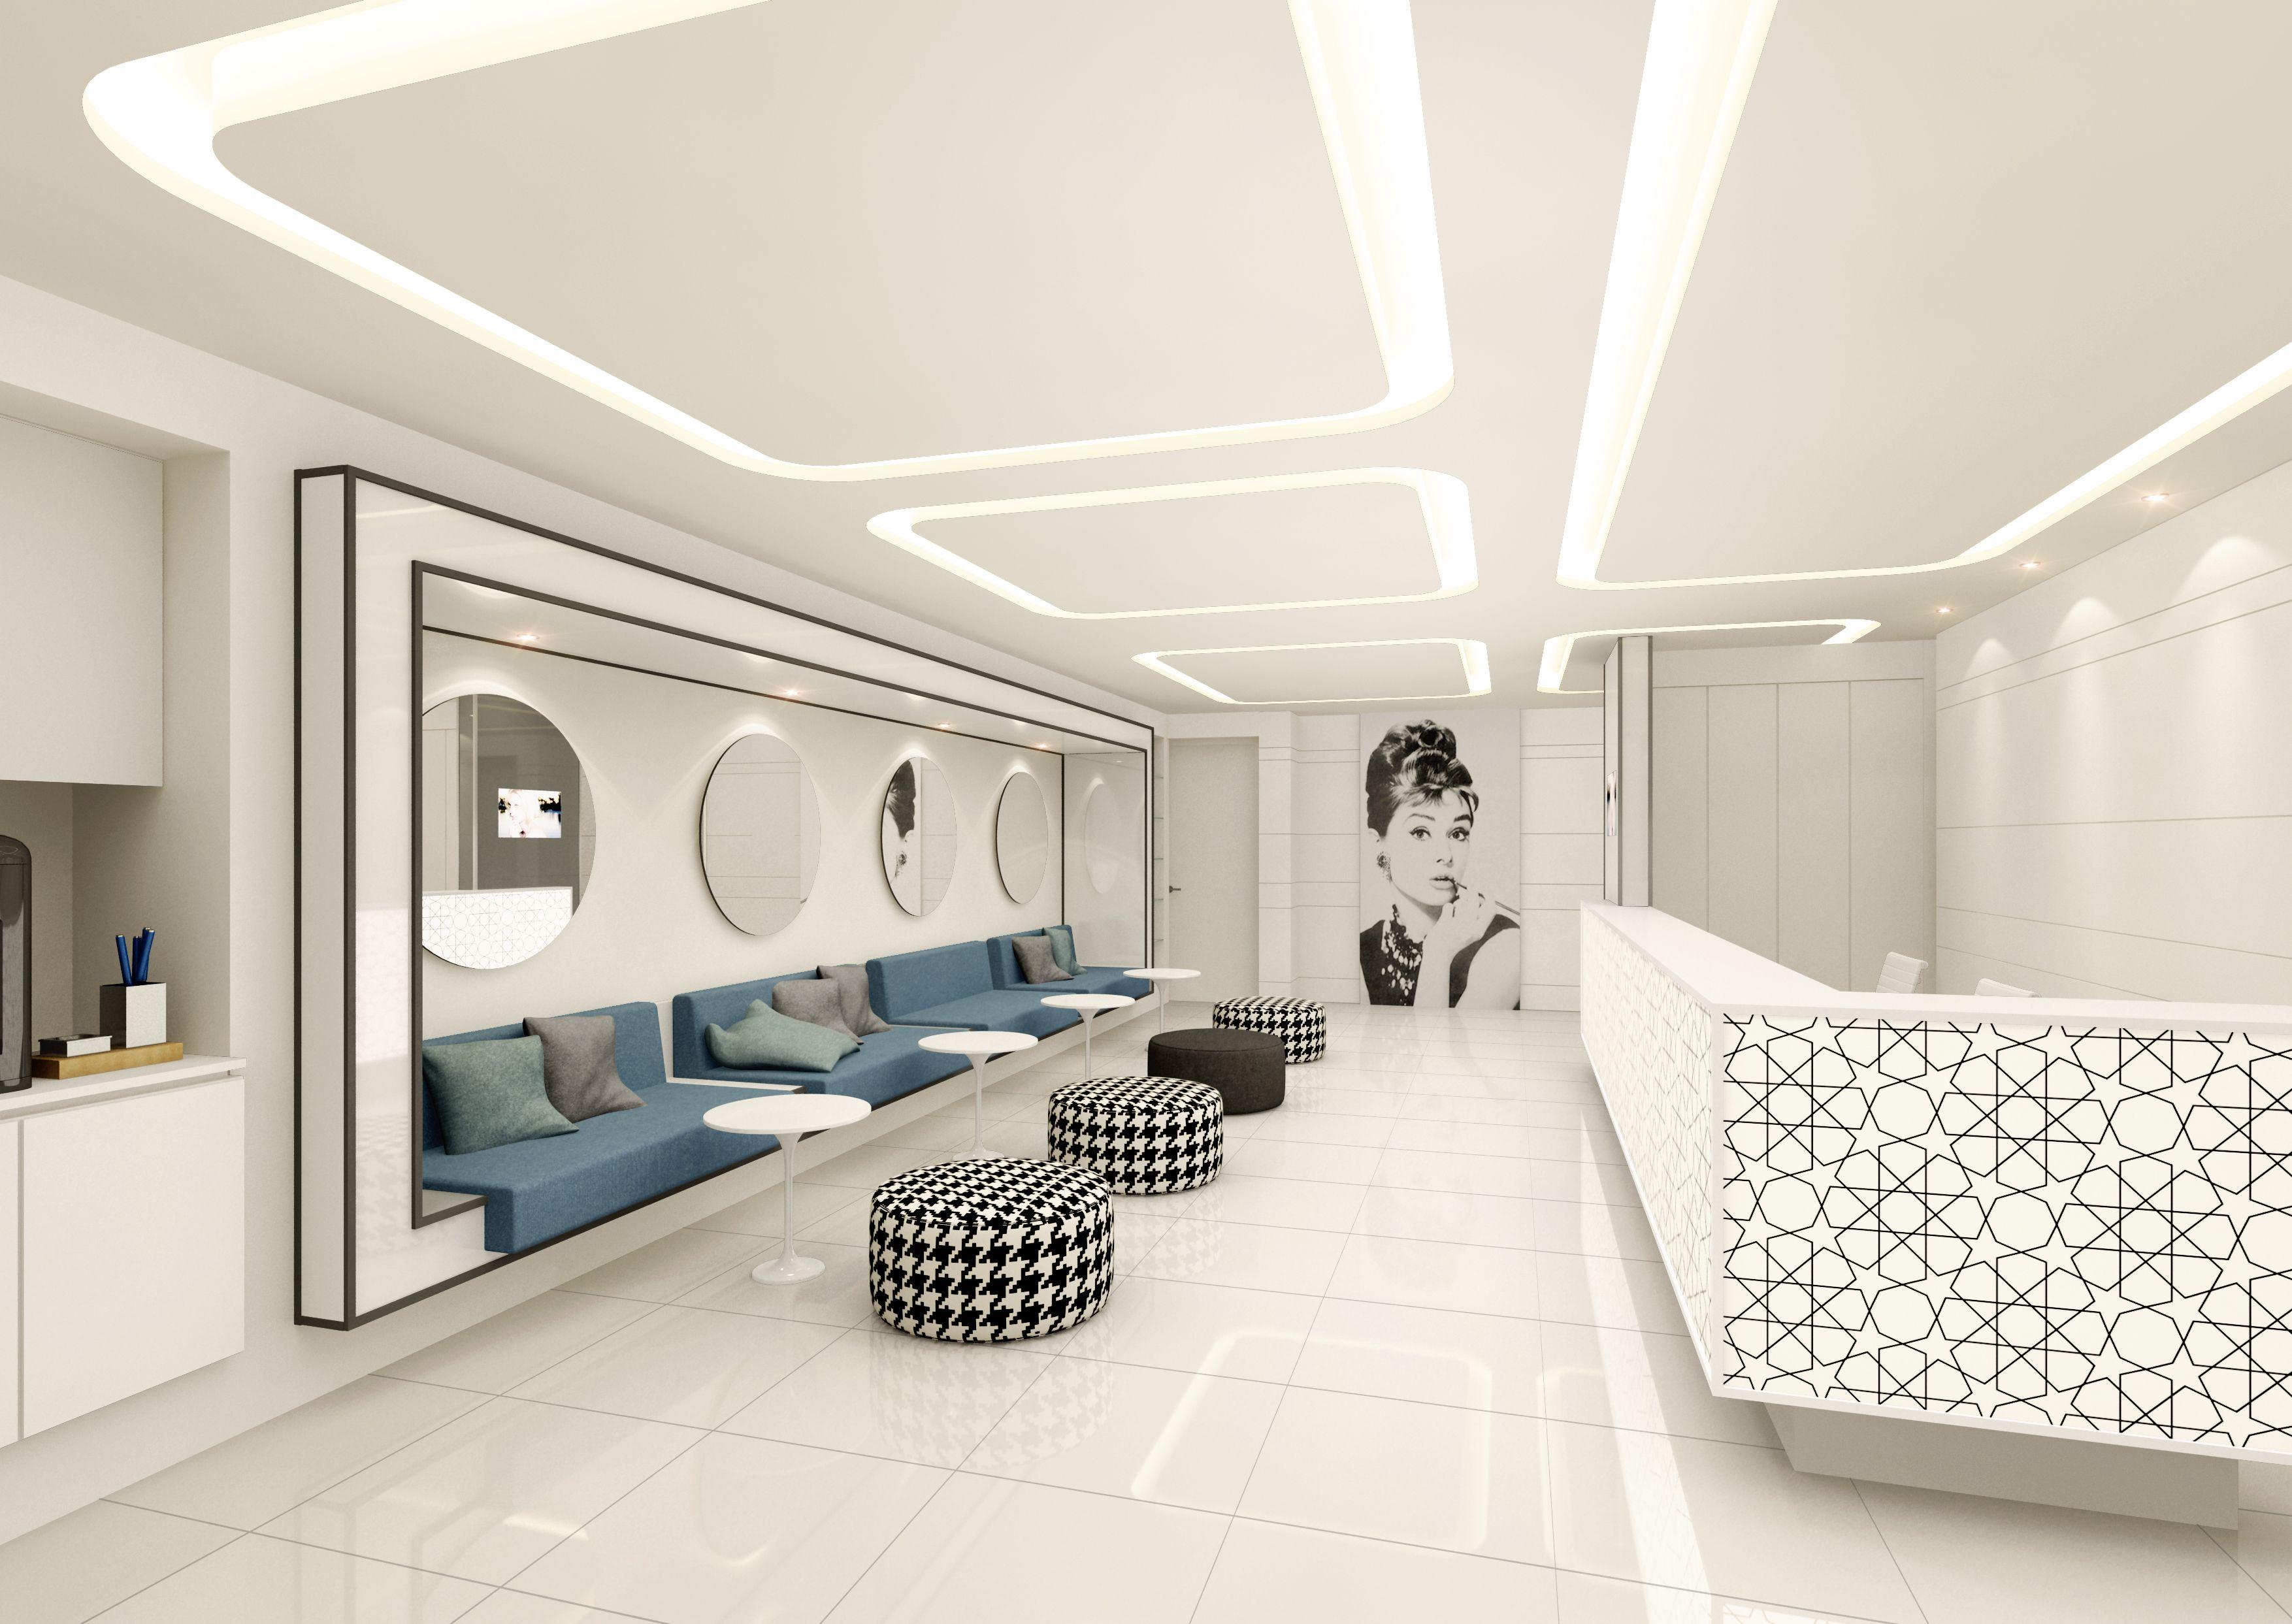 Clinic Designed By BALSANG. KOREA